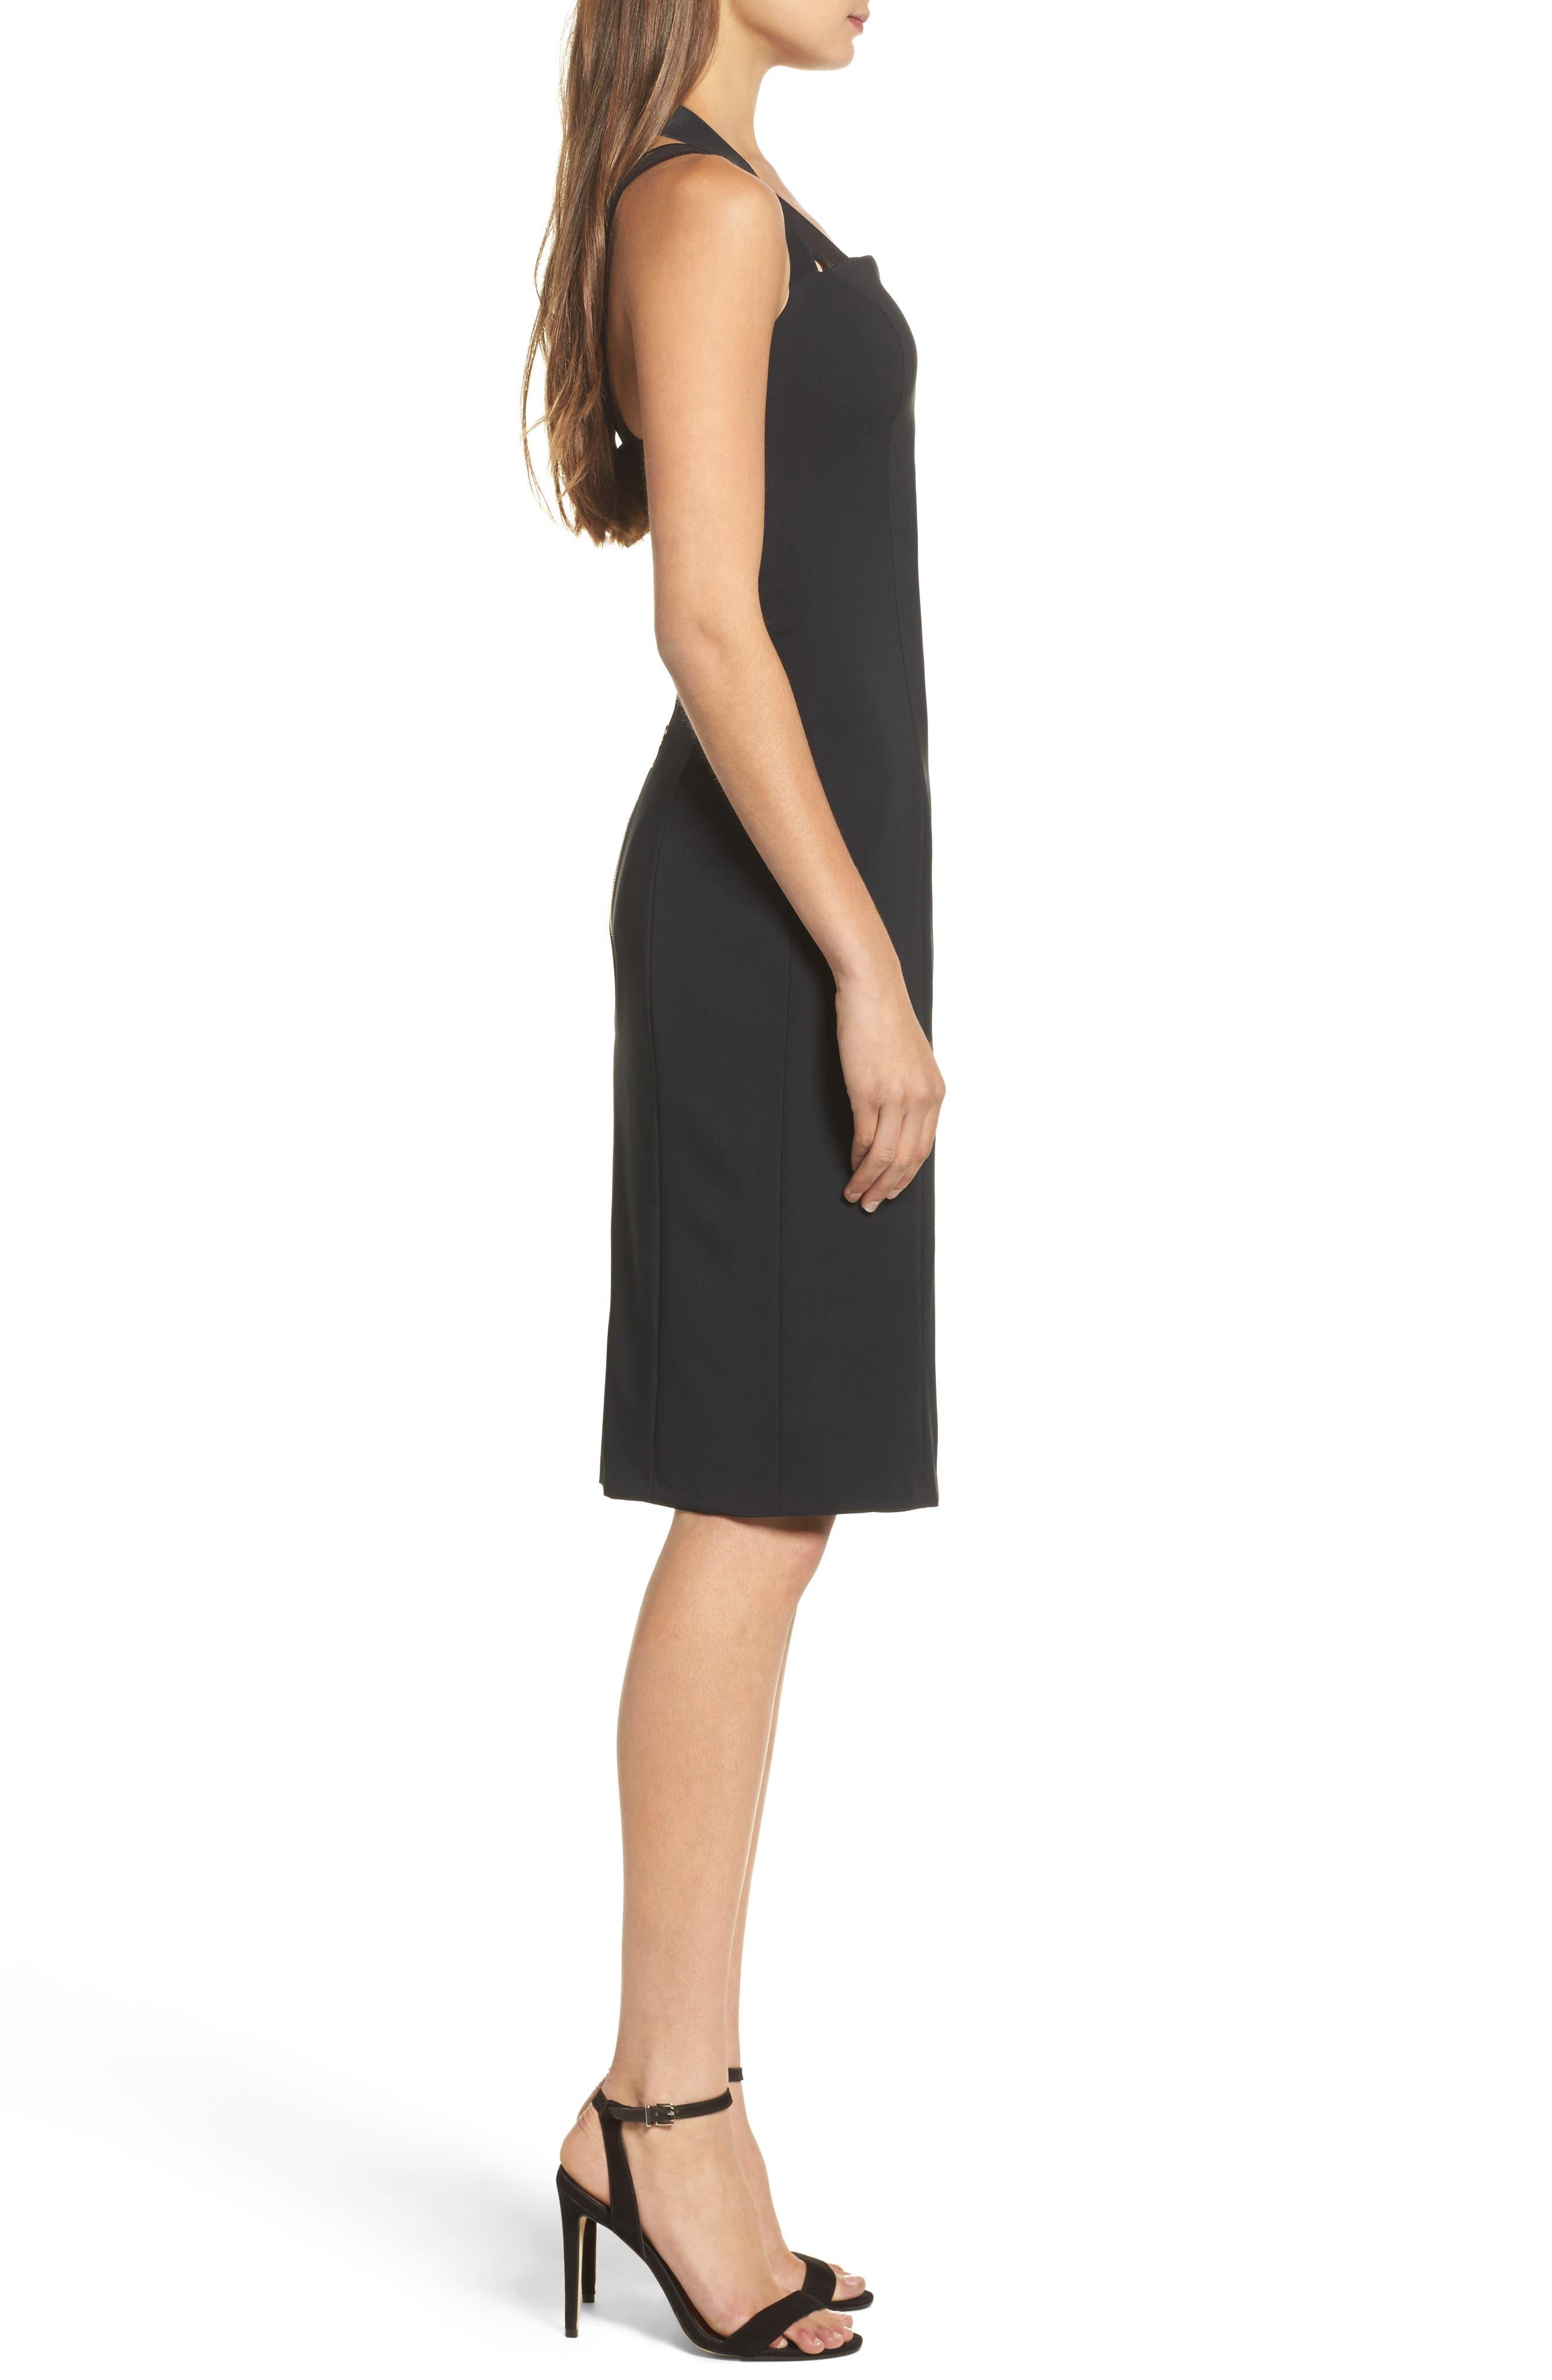 Kendra Elastic Strap Low Back Sheath Dress,                             Alternate thumbnail 3, color,                             Black